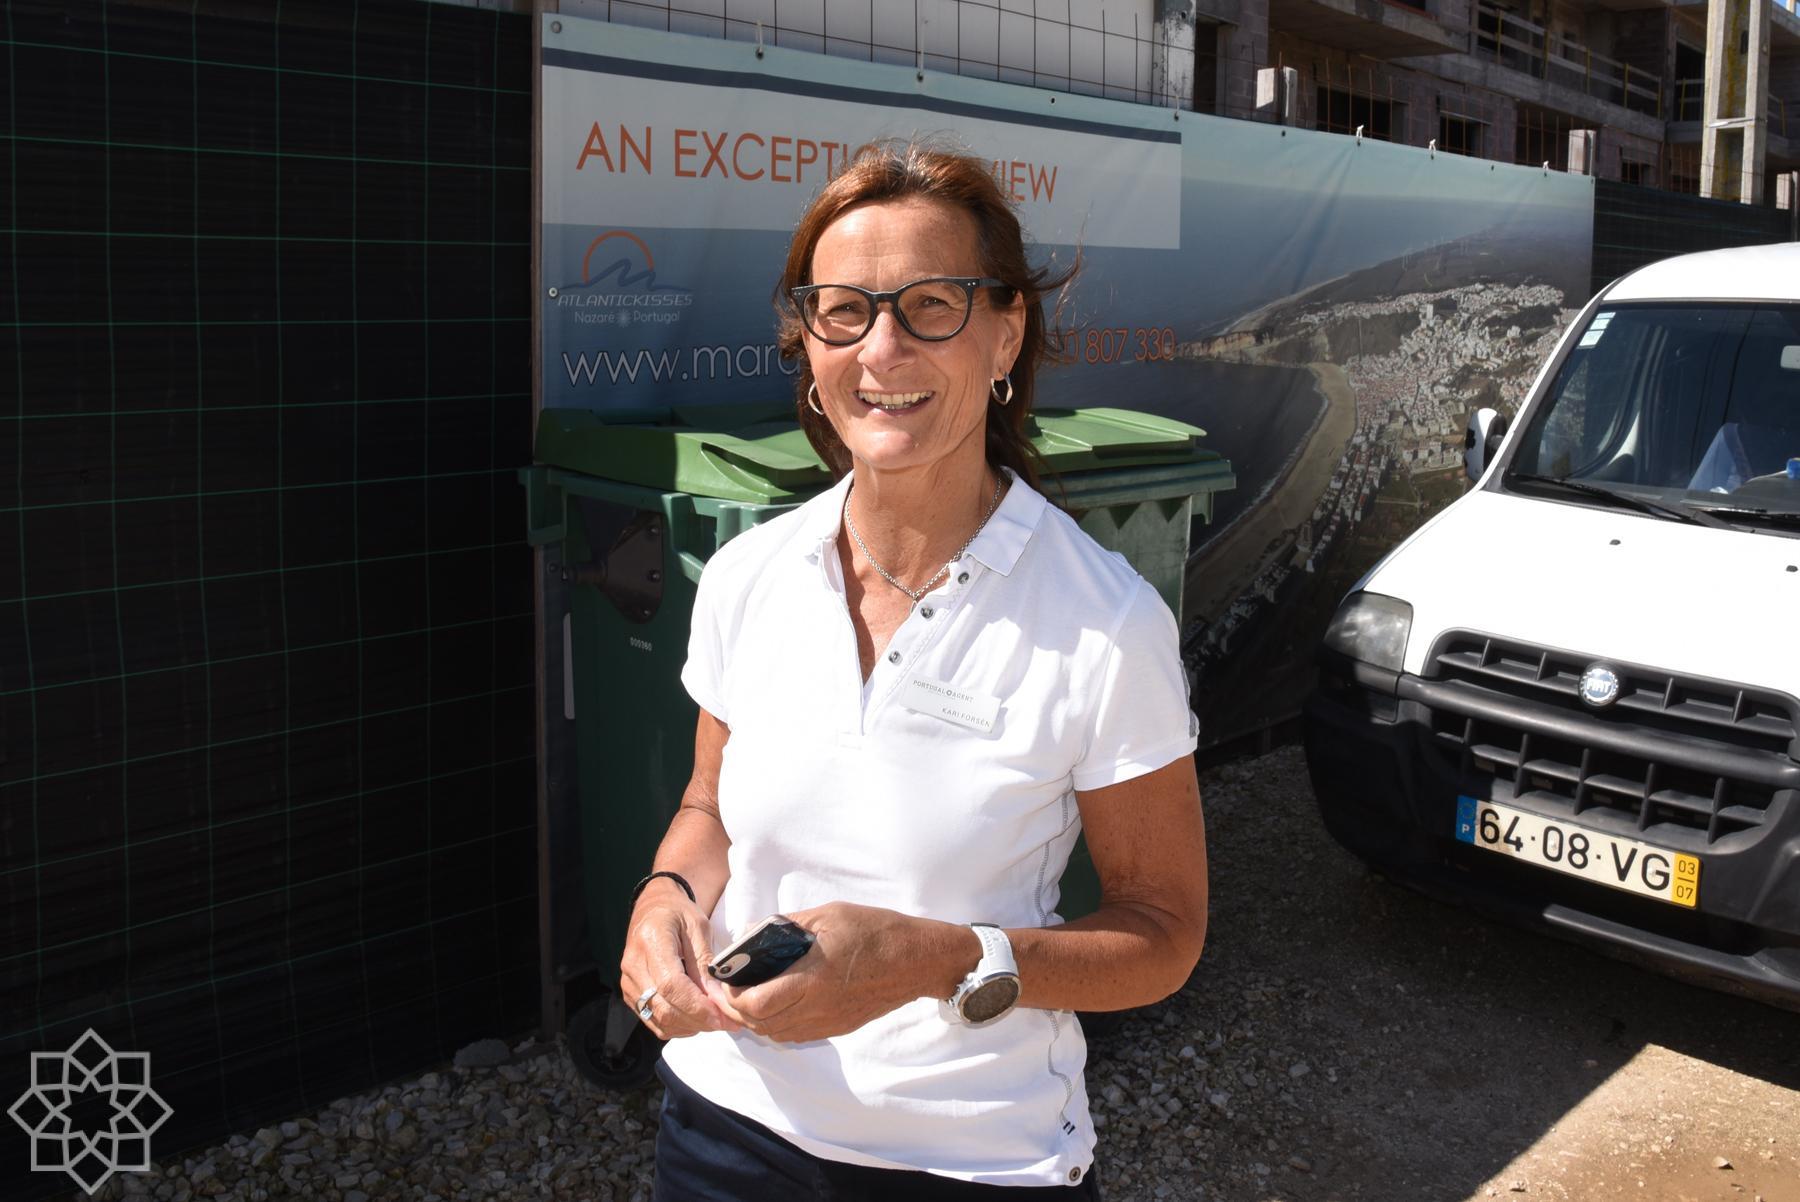 Kari Forsén at Portugal Agent